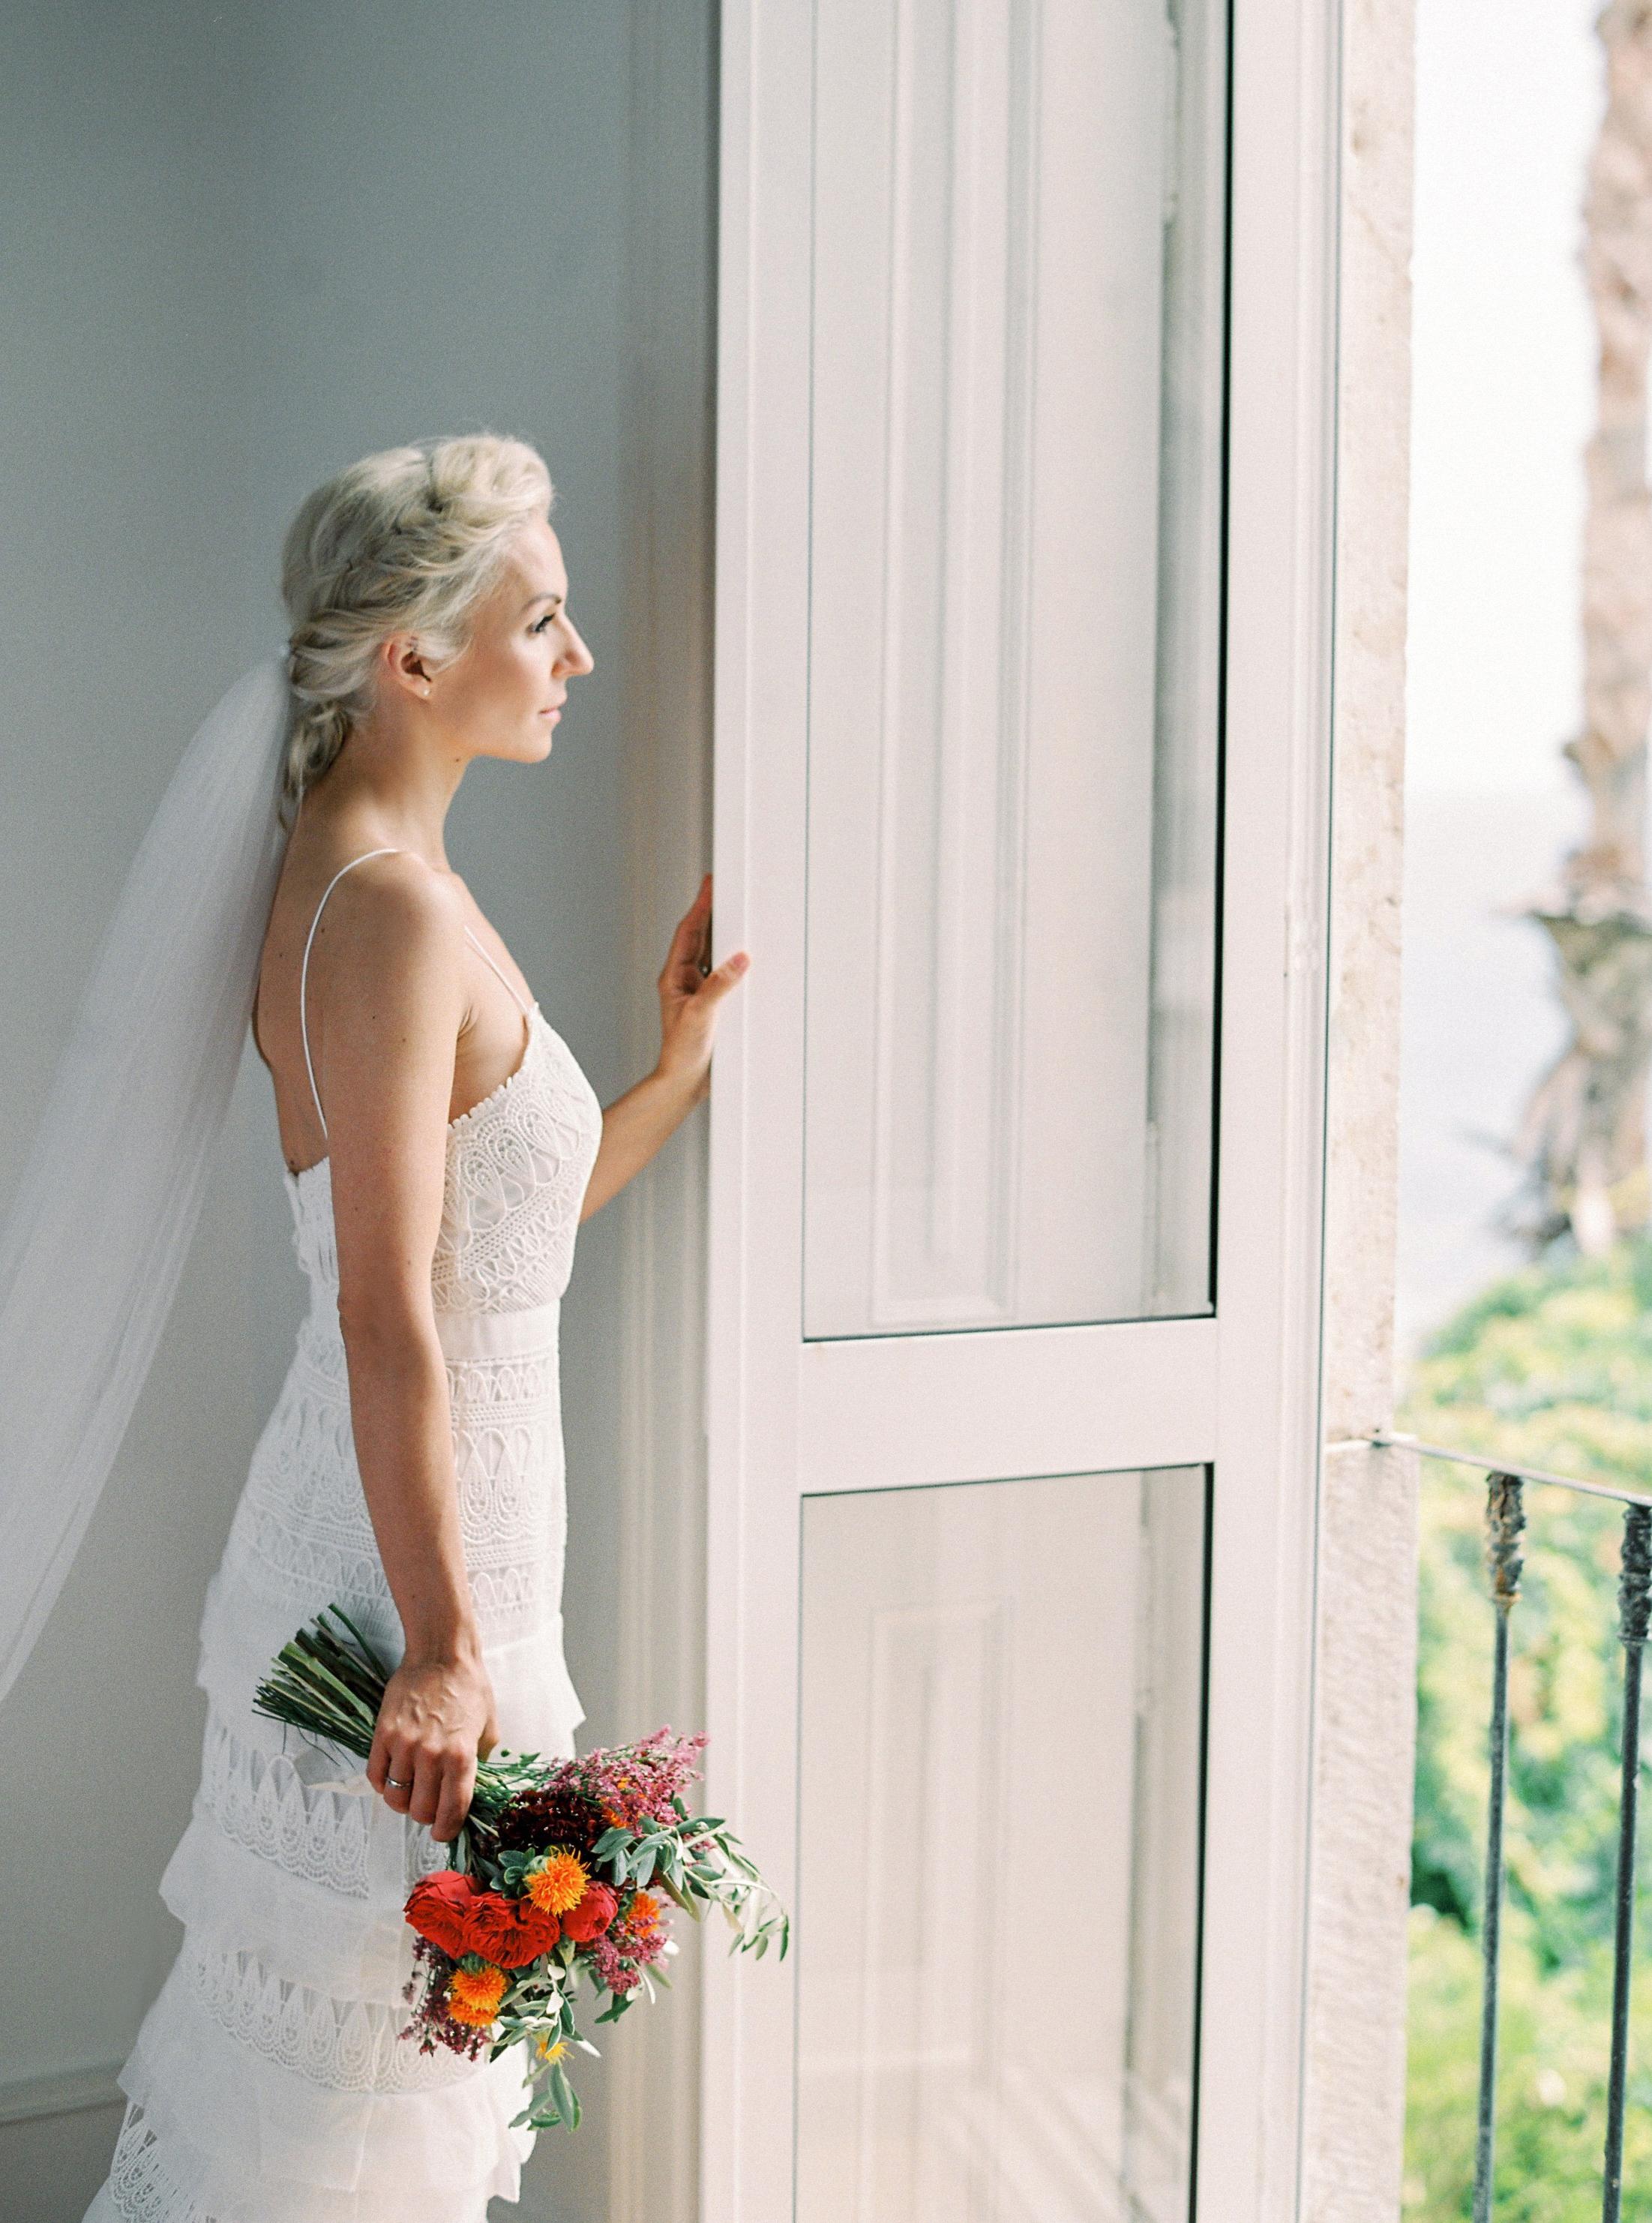 Nastia_Vesna_Photography_Wedding_Portugal_6.jpg